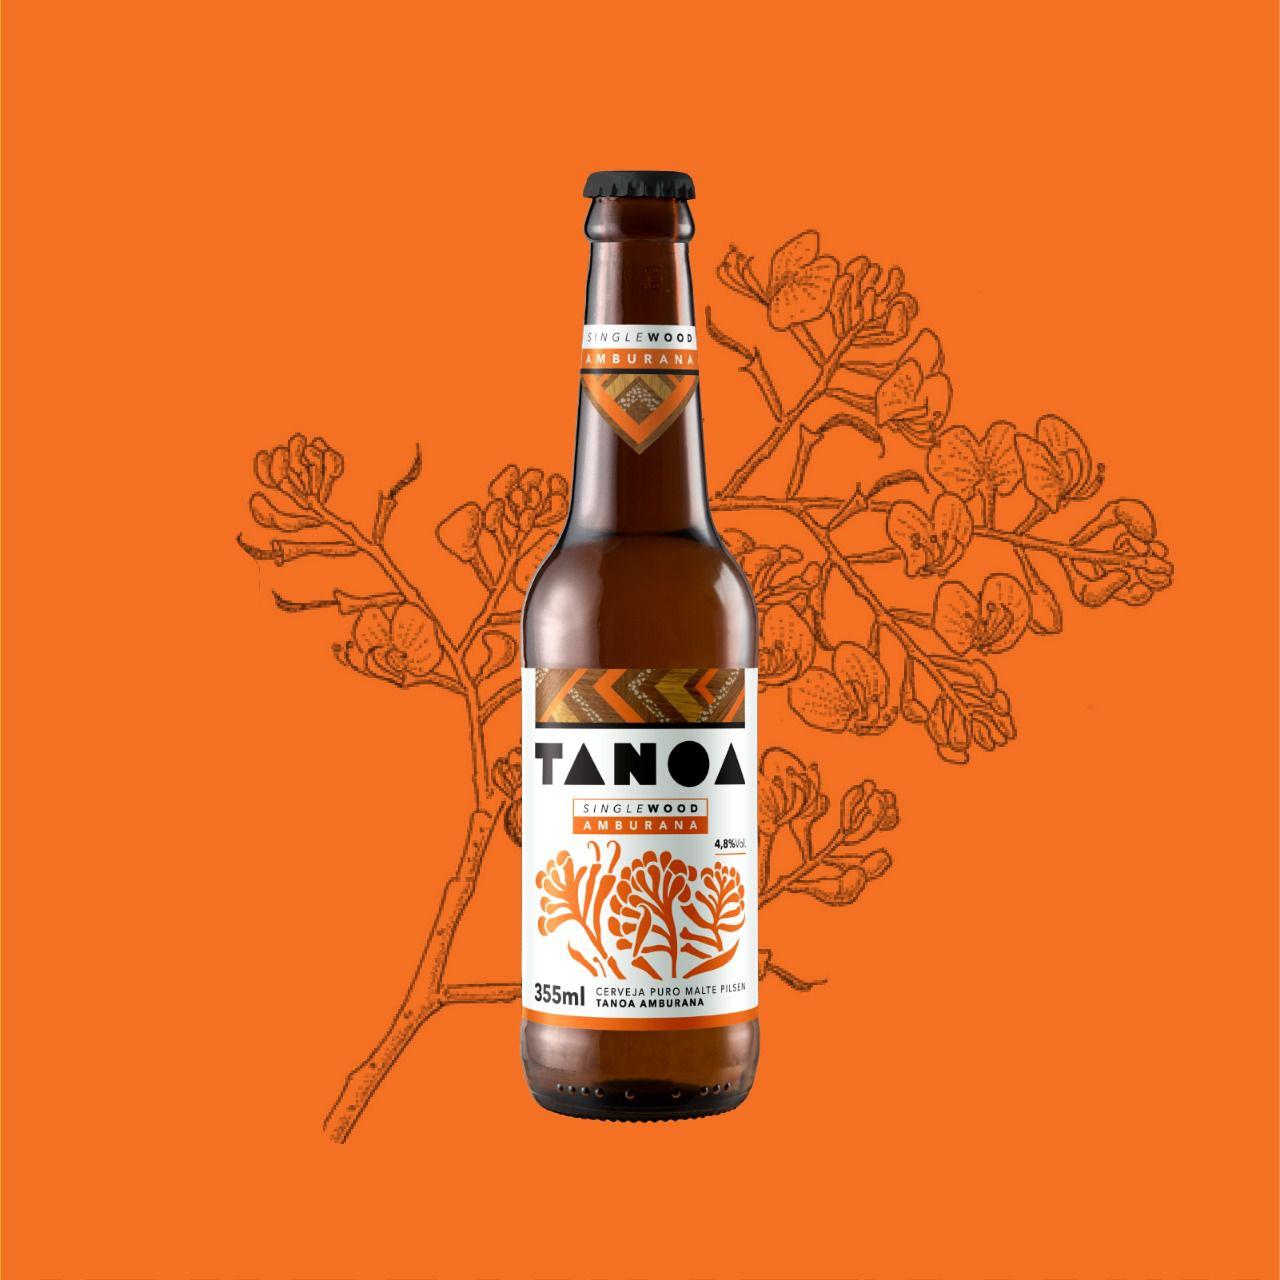 TANOA PILSEN - Single Wood: Amburana (6 unidades) 355 ml